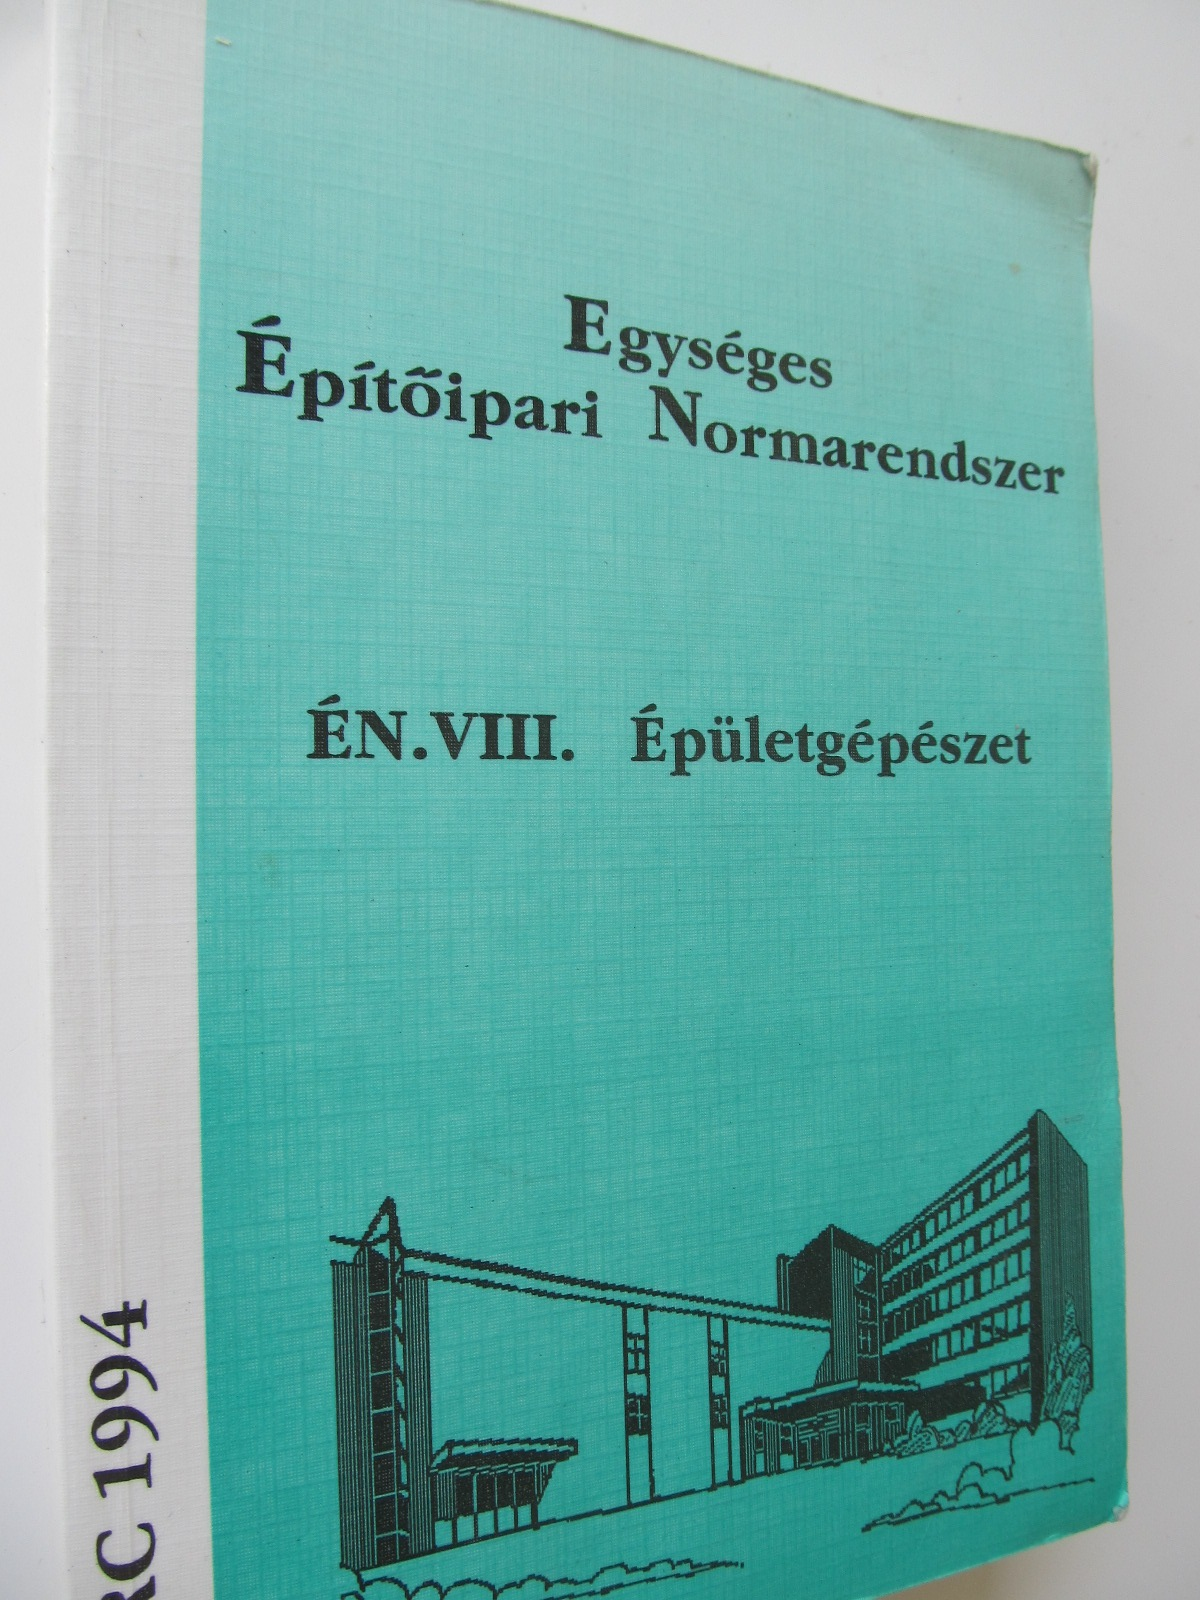 Egyseges Epitoipari Normarendszer En VIII Epuletgepezet (Normativ constructii) - *** | Detalii carte